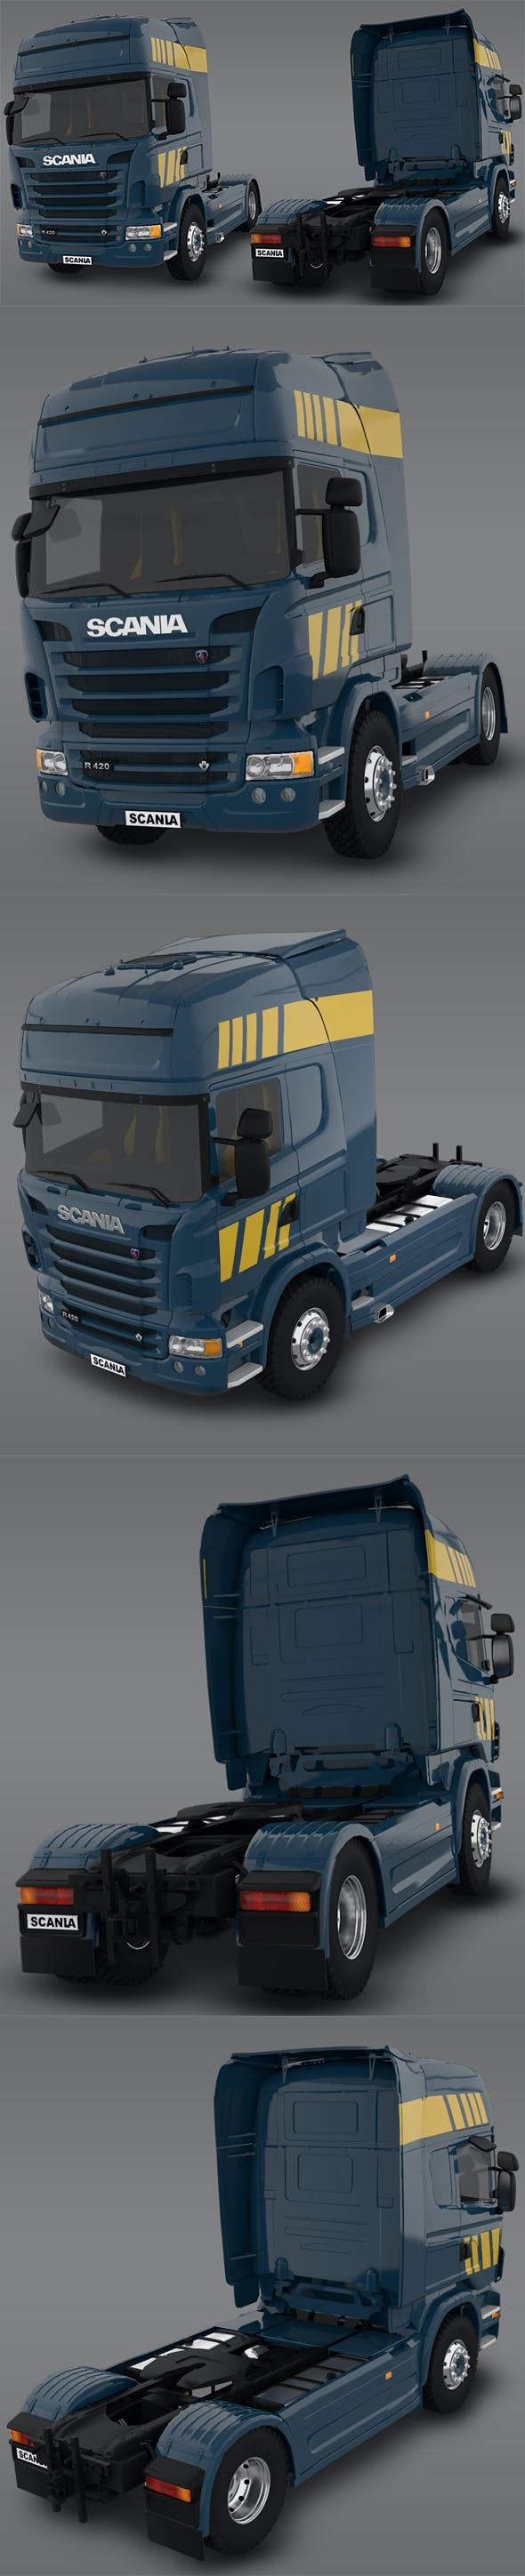 Scania R480 2008 3D Model - 3DOcean Item for Sale